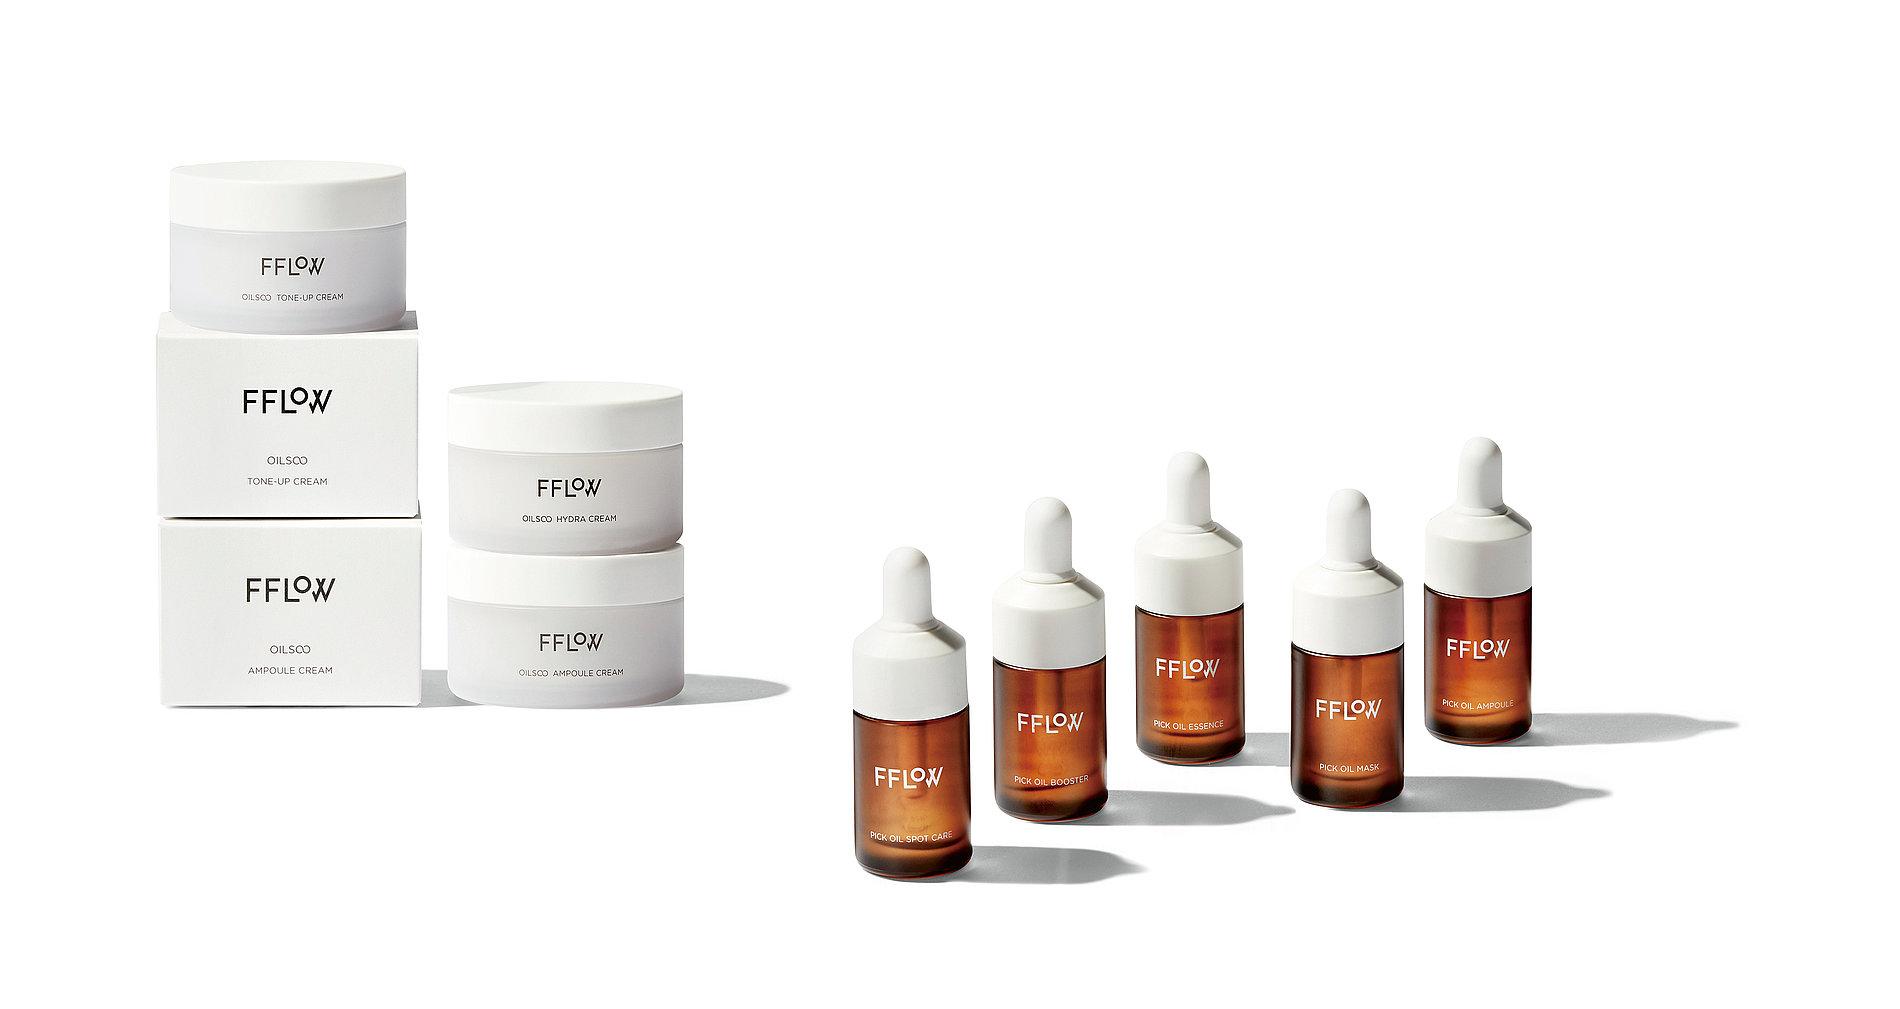 FFLOW Oil-Soo | Red Dot Design Award